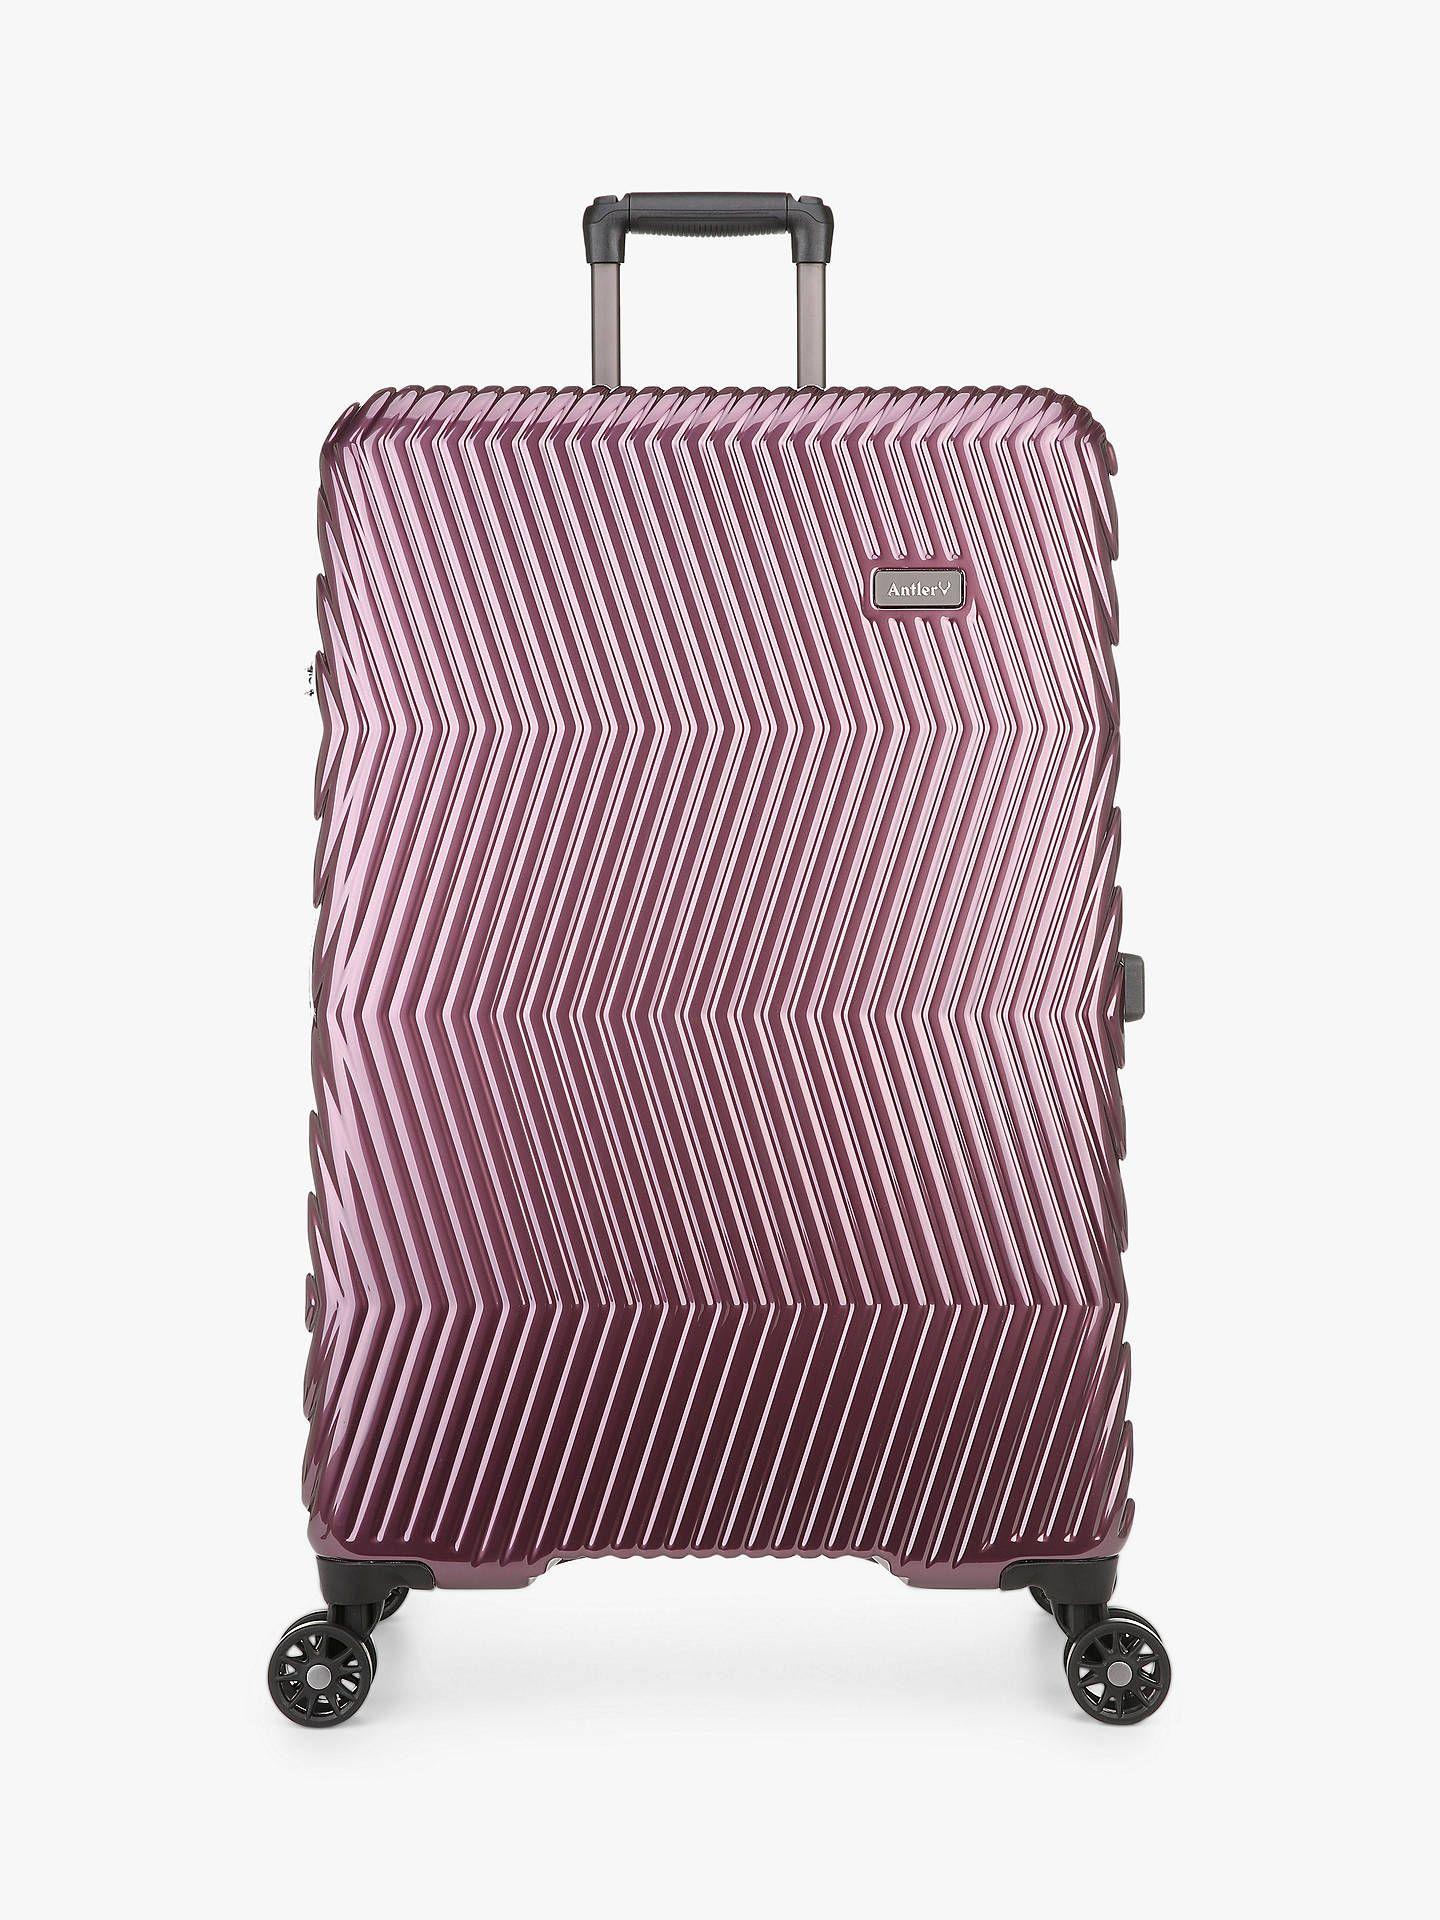 Antler Viva 4-Wheel 80cm Large Suitcase, Aubergine at John Lewis & Partners for £73.50